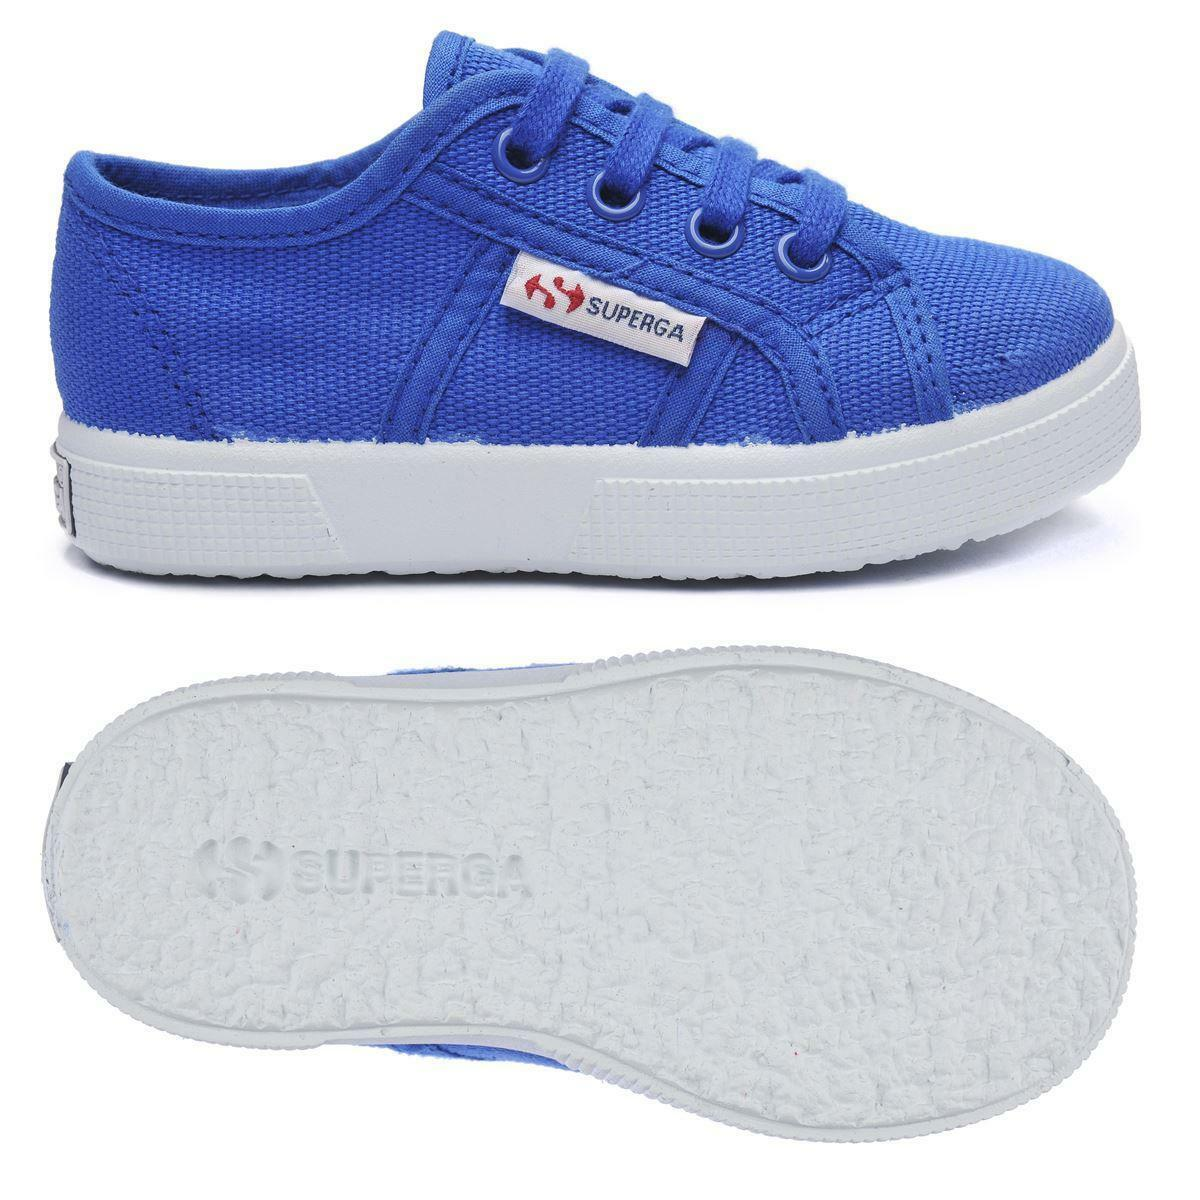 superga superga sneakers bambino 2750 torchietto blu